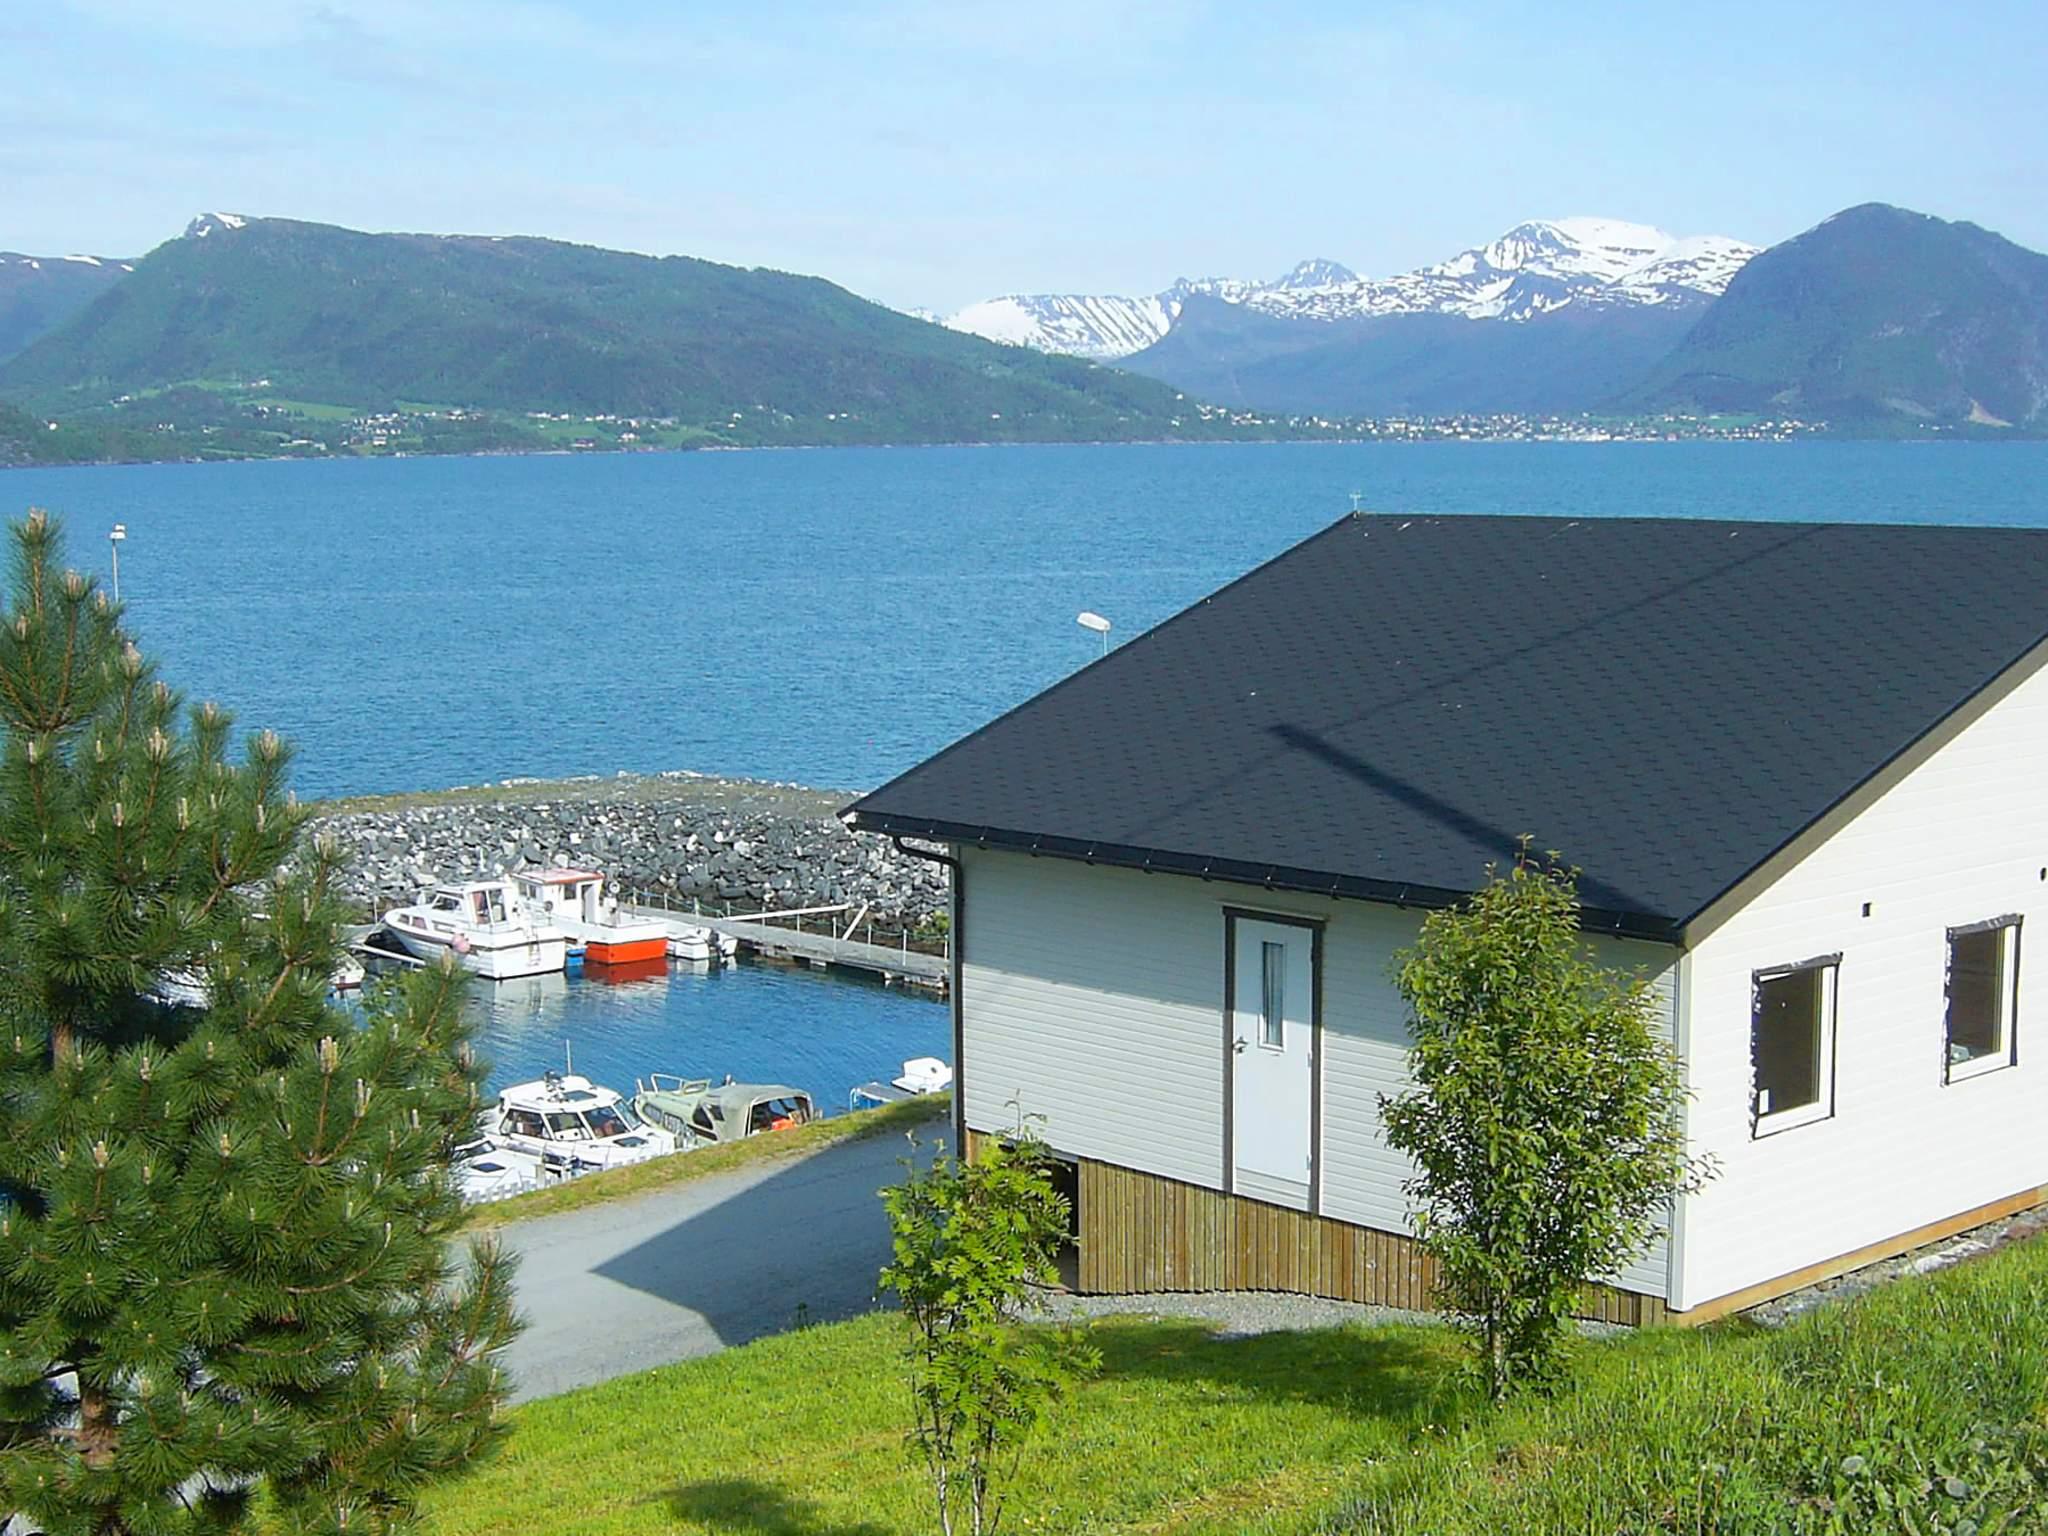 Ferienhaus Lauvstad (276049), Lauvstad, More - Romsdal, Westnorwegen, Norwegen, Bild 1